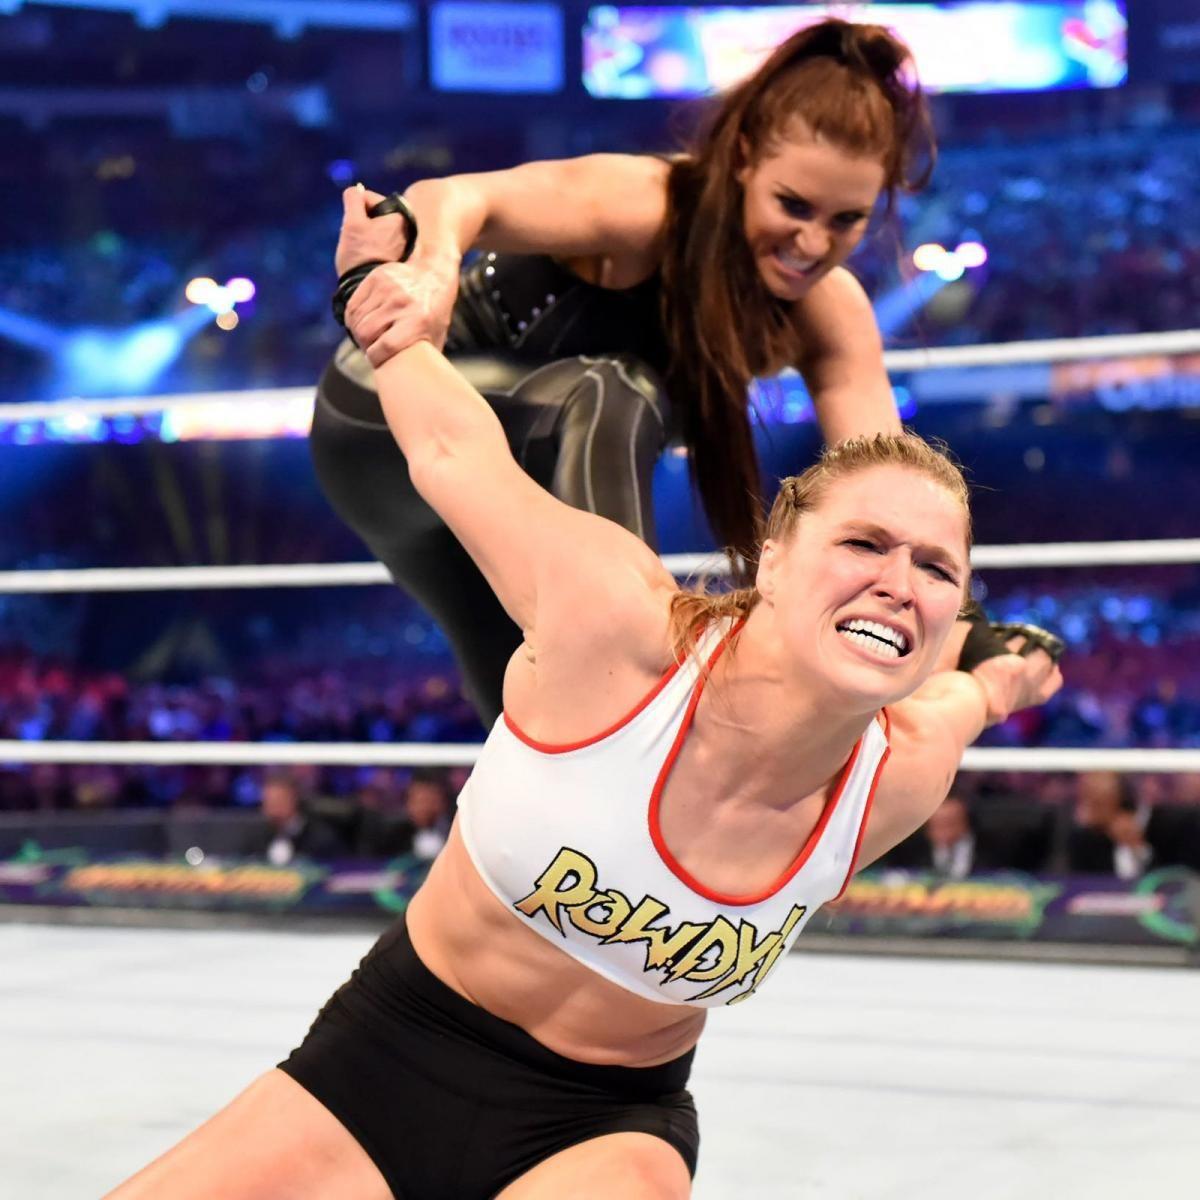 WWE Photo | Ronda rousey, Stephanie mcmahon, Ronda